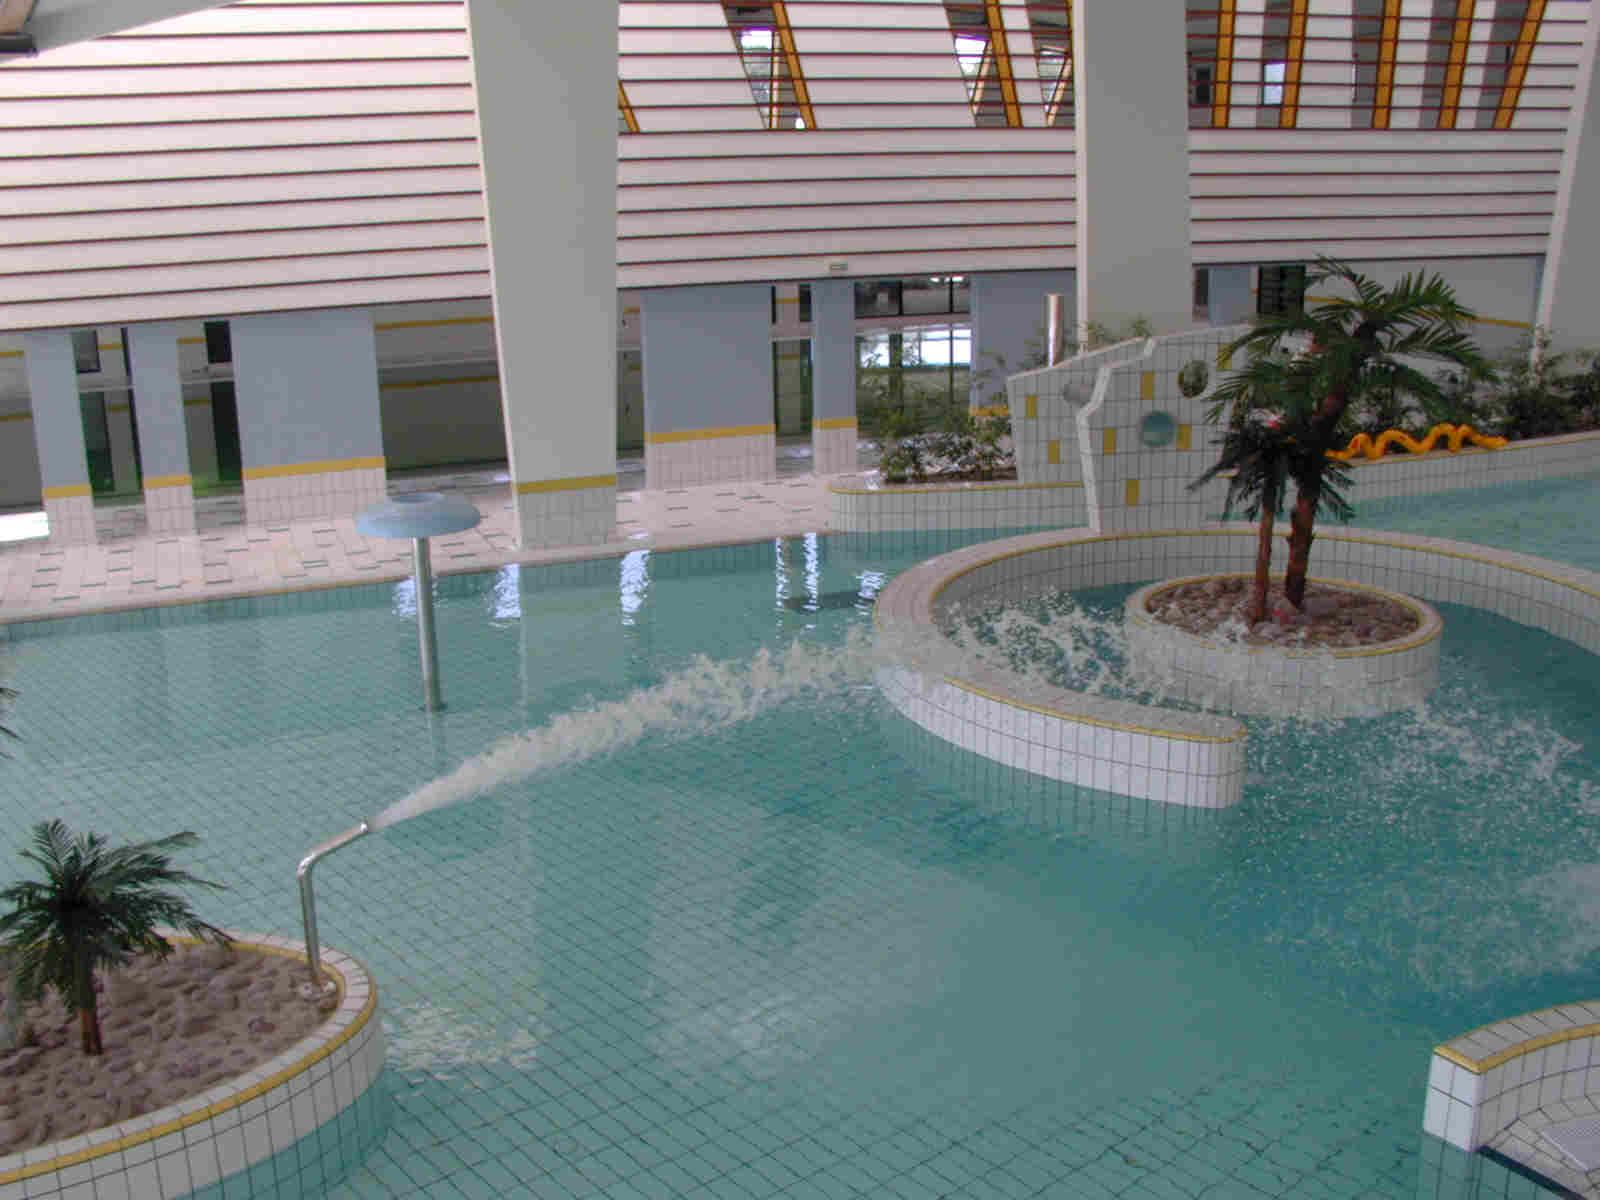 La piscine - Piscine de la potennerie ...